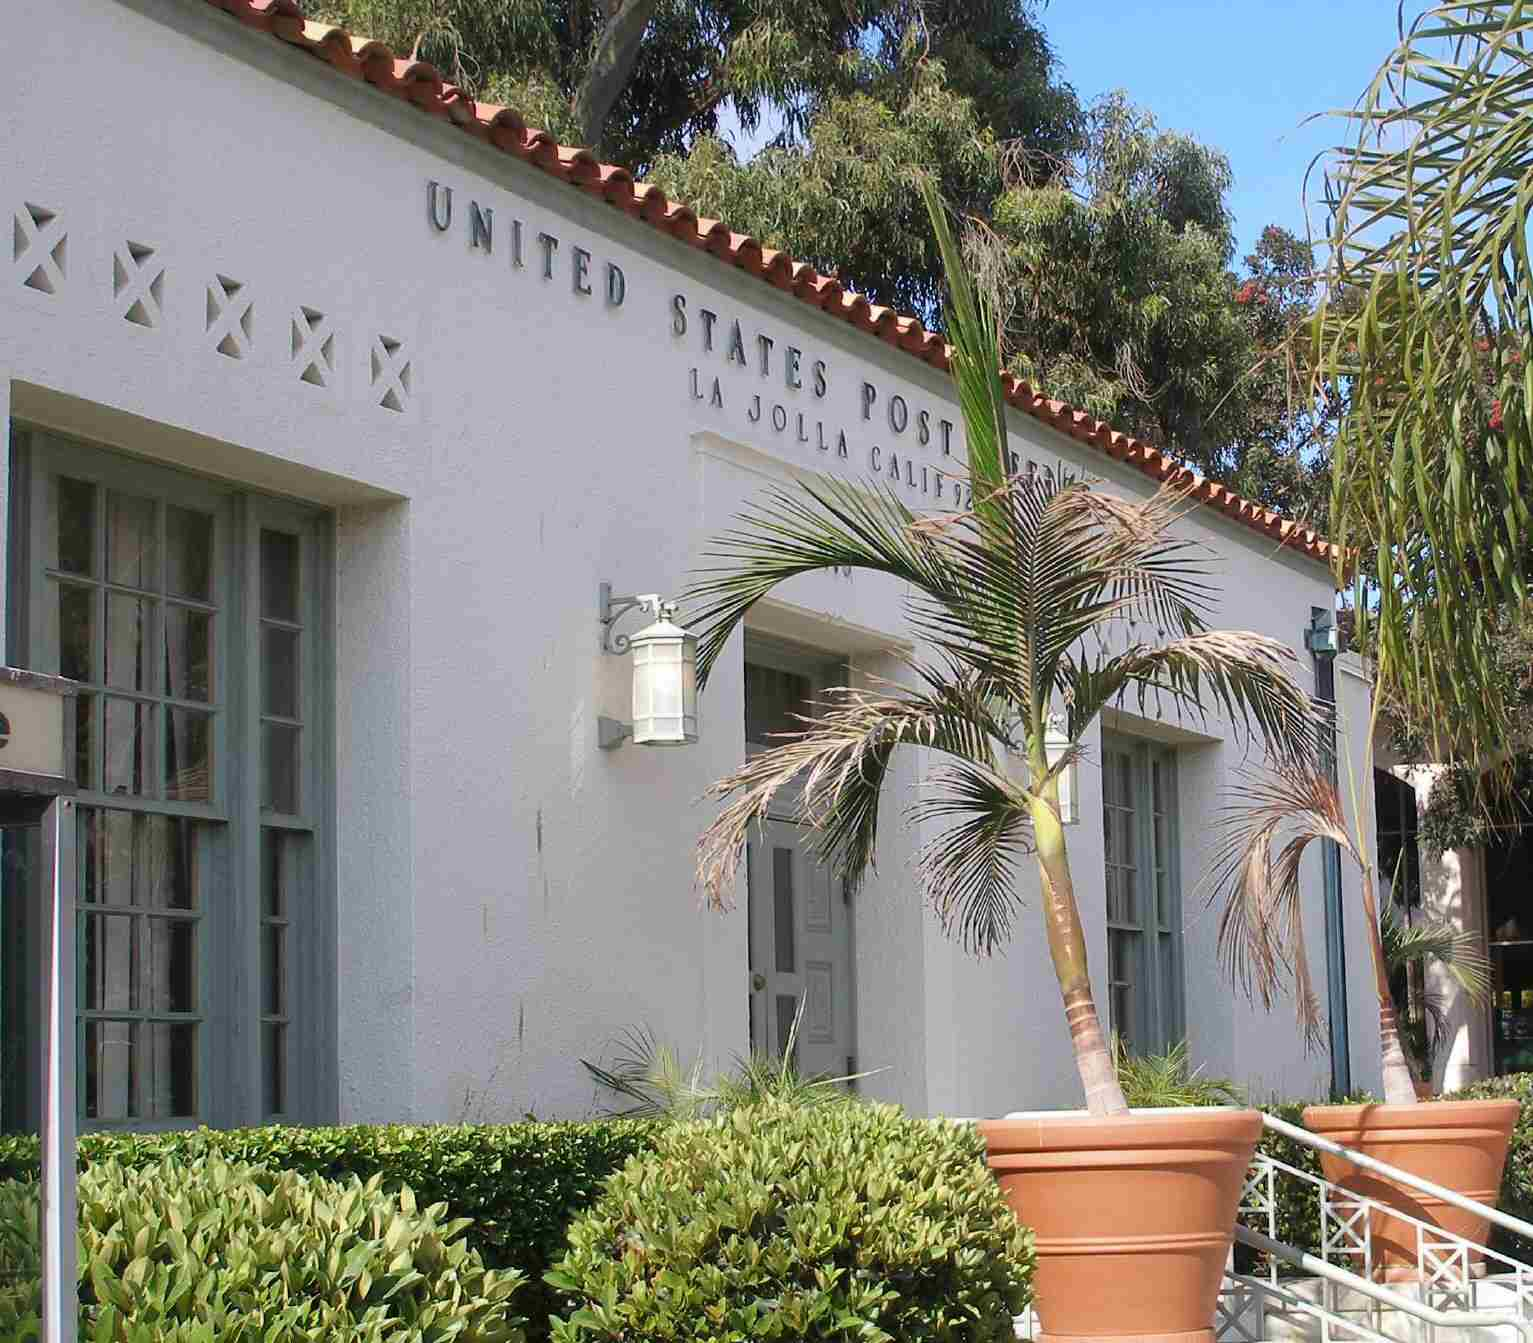 Photo of post office building in La Jolla, California